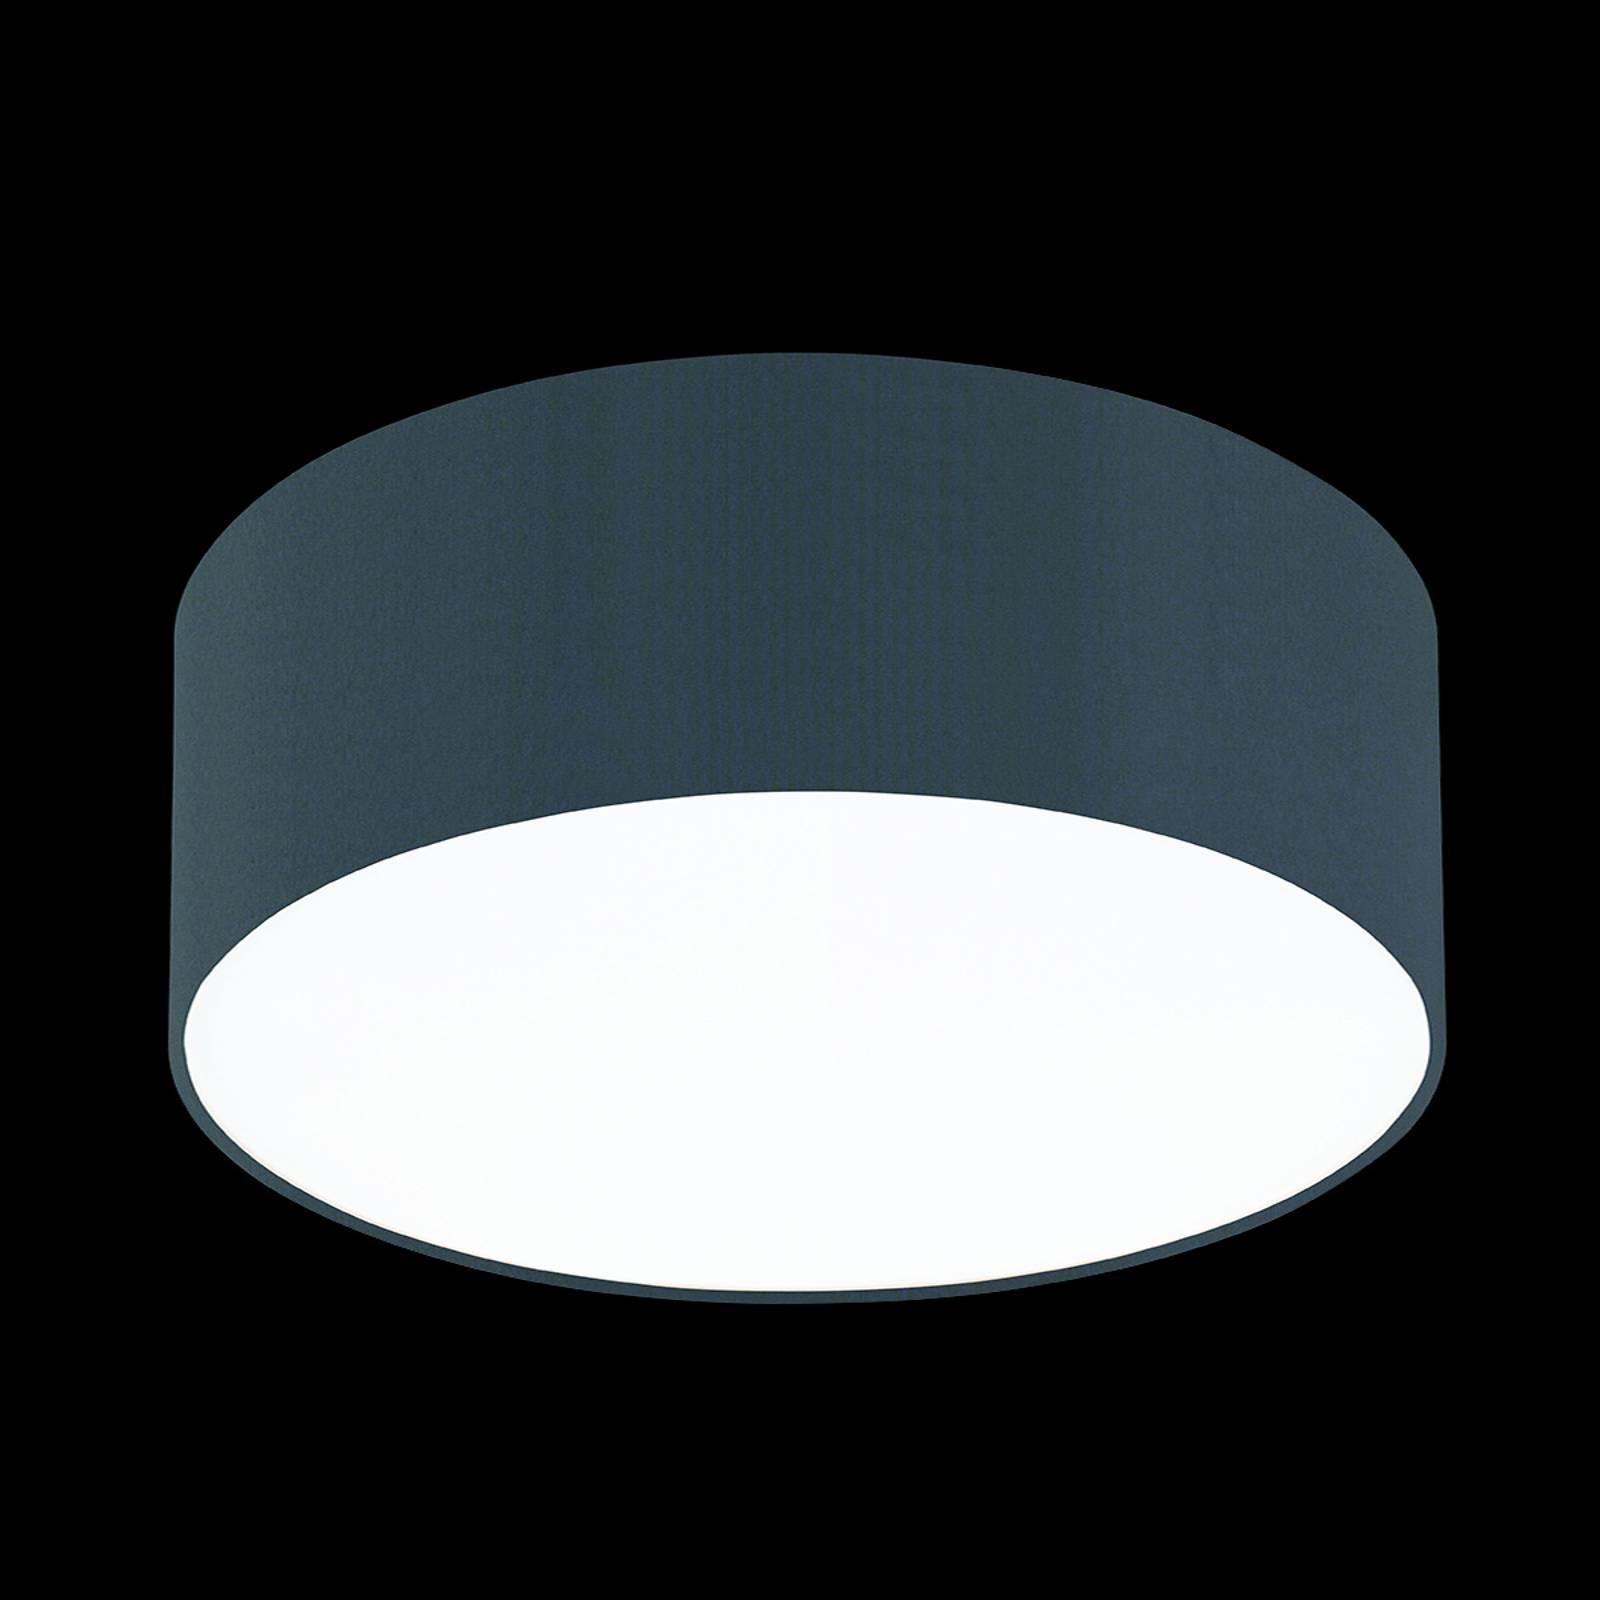 Leisteengrijze plafondlamp Mara, 50 cm